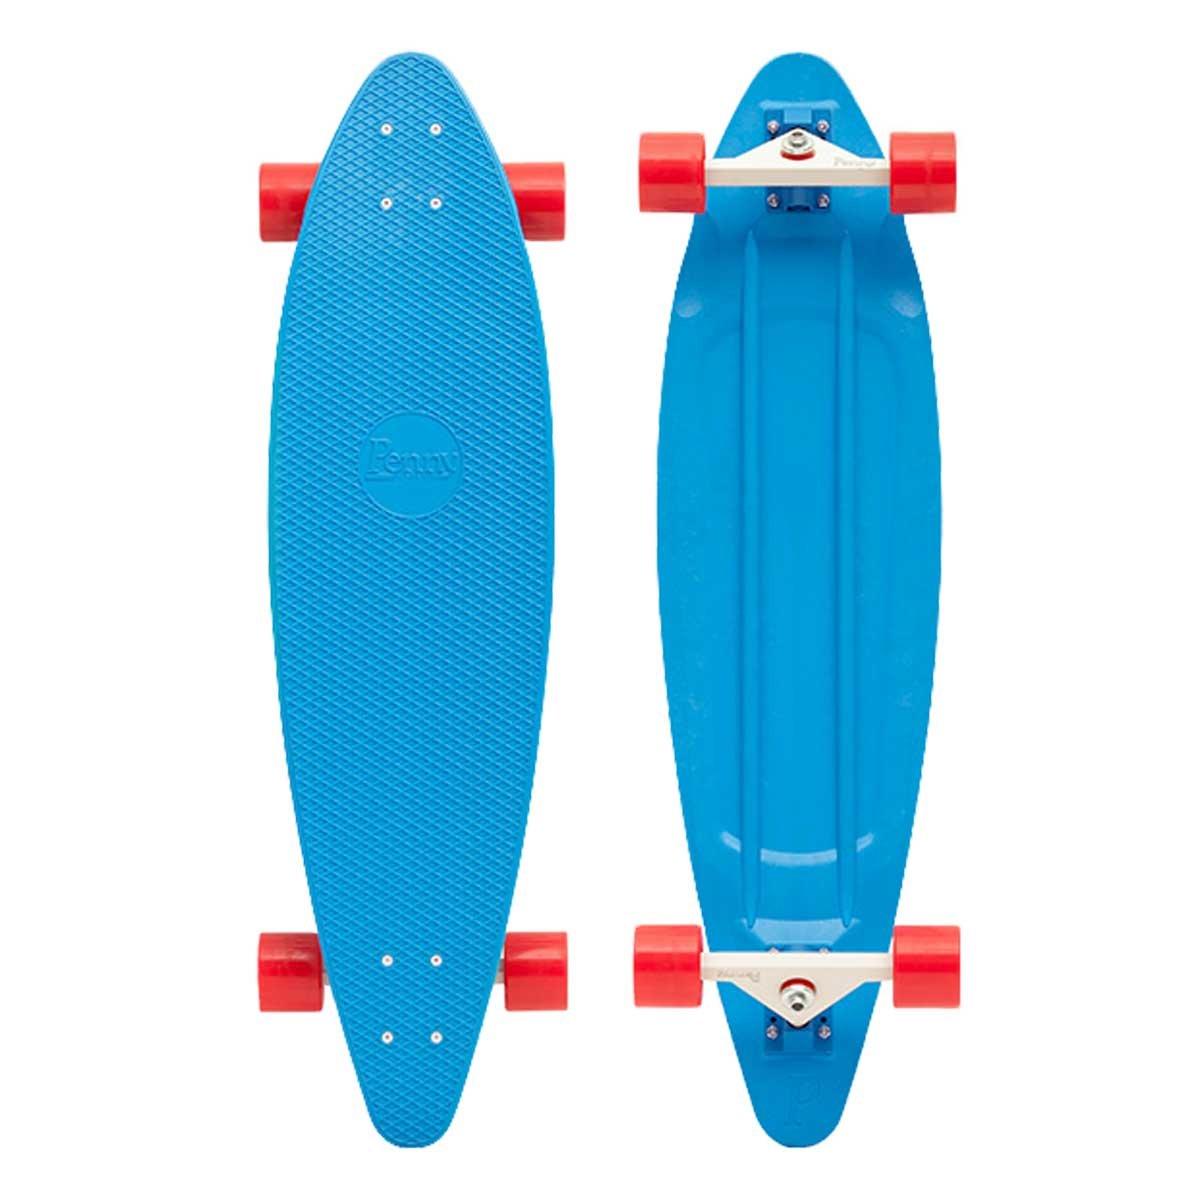 Panny skateboards Panny Long skateboards boards boards 36インチ/ペニースケートボード ロングボード B079L453TH, パーツキング:810d35e3 --- integralved.hu